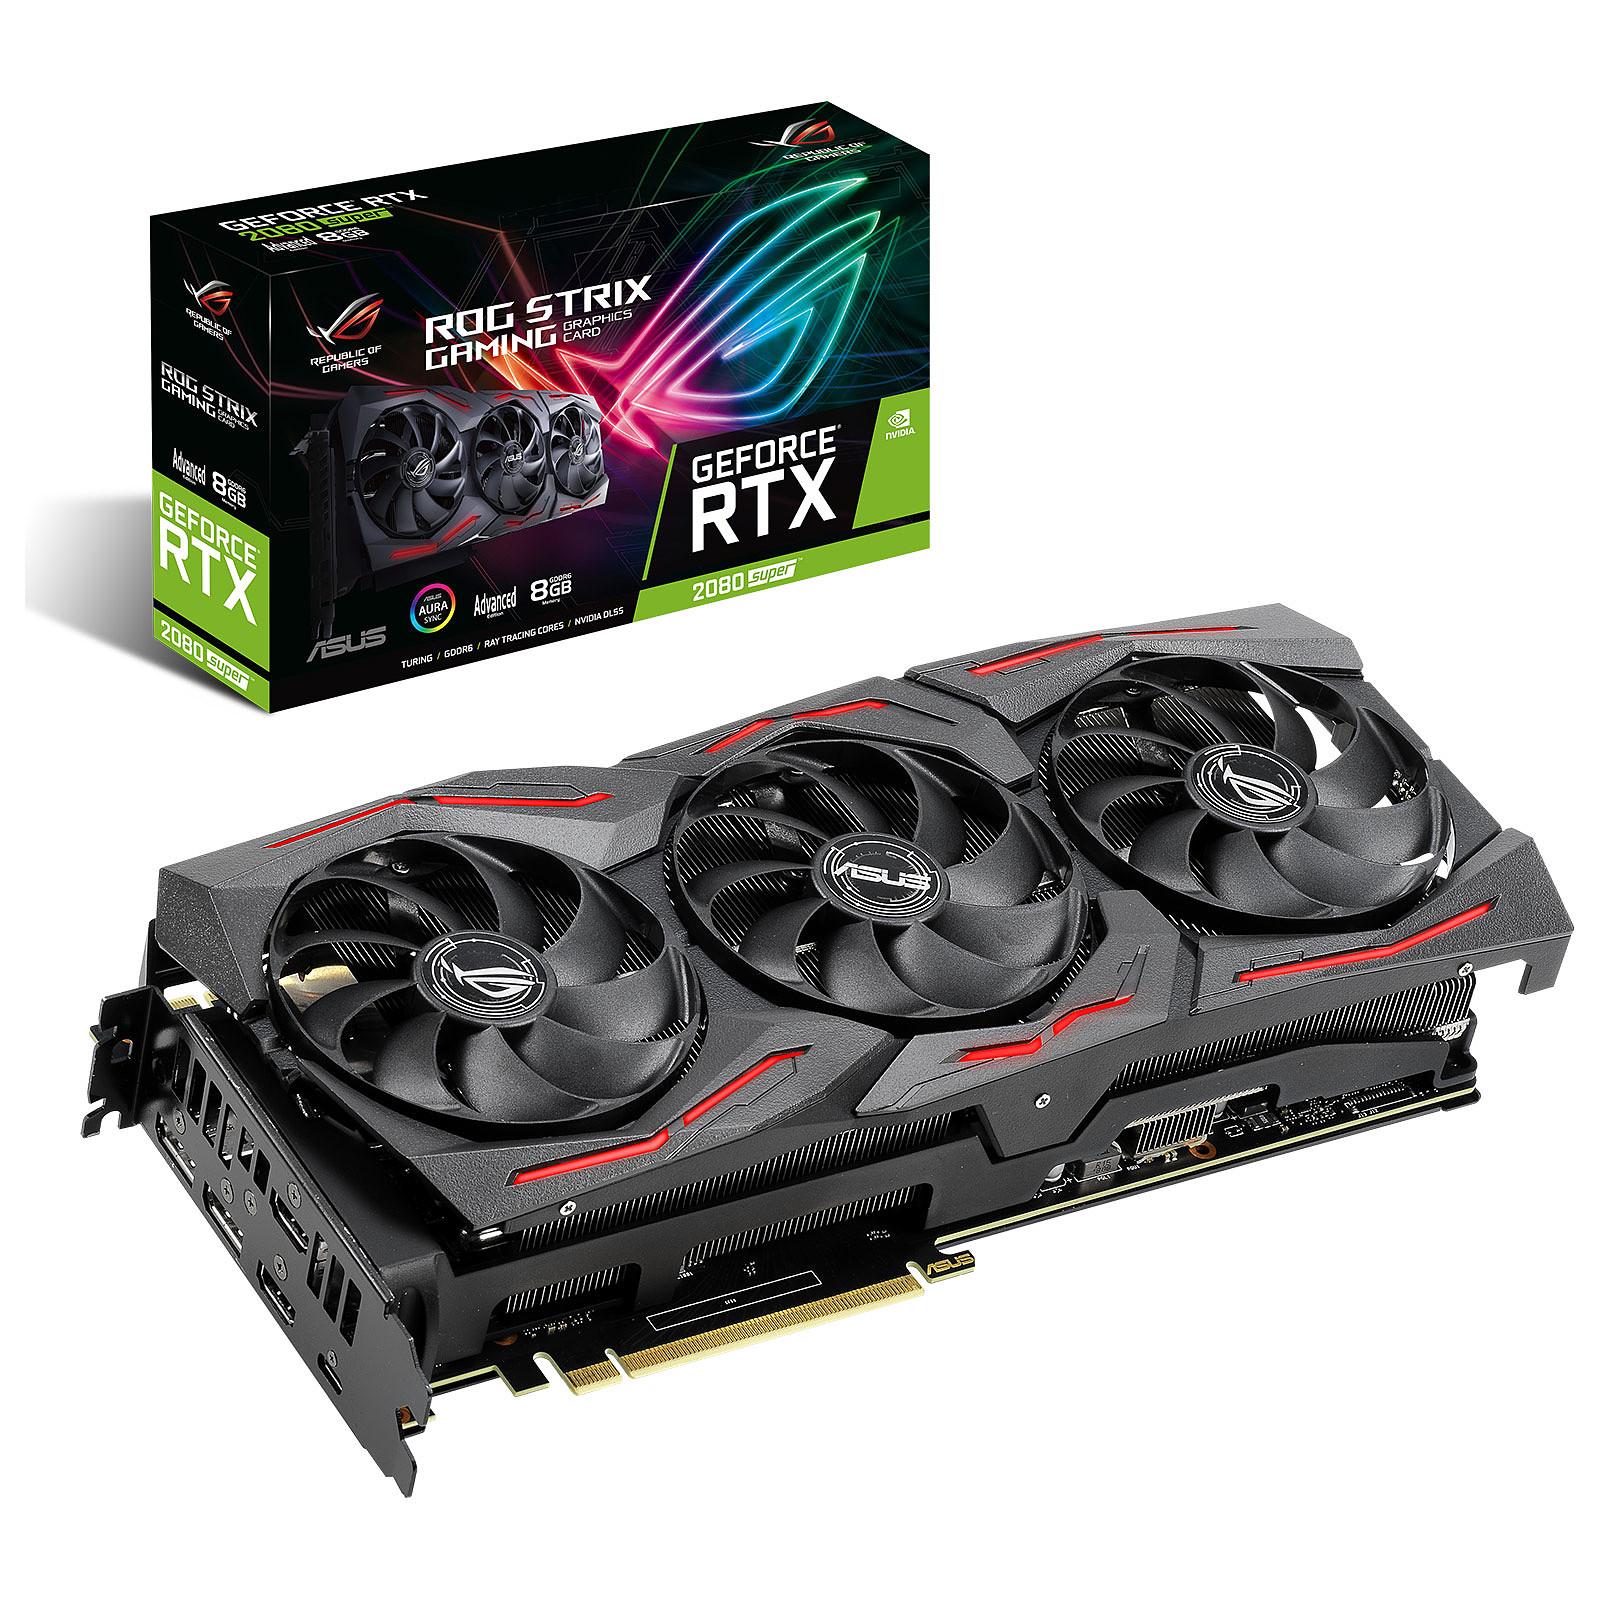 ASUS GeForce RTX 2080 SUPER ROG-STRIX-RTX2080S-A8G-GAMING